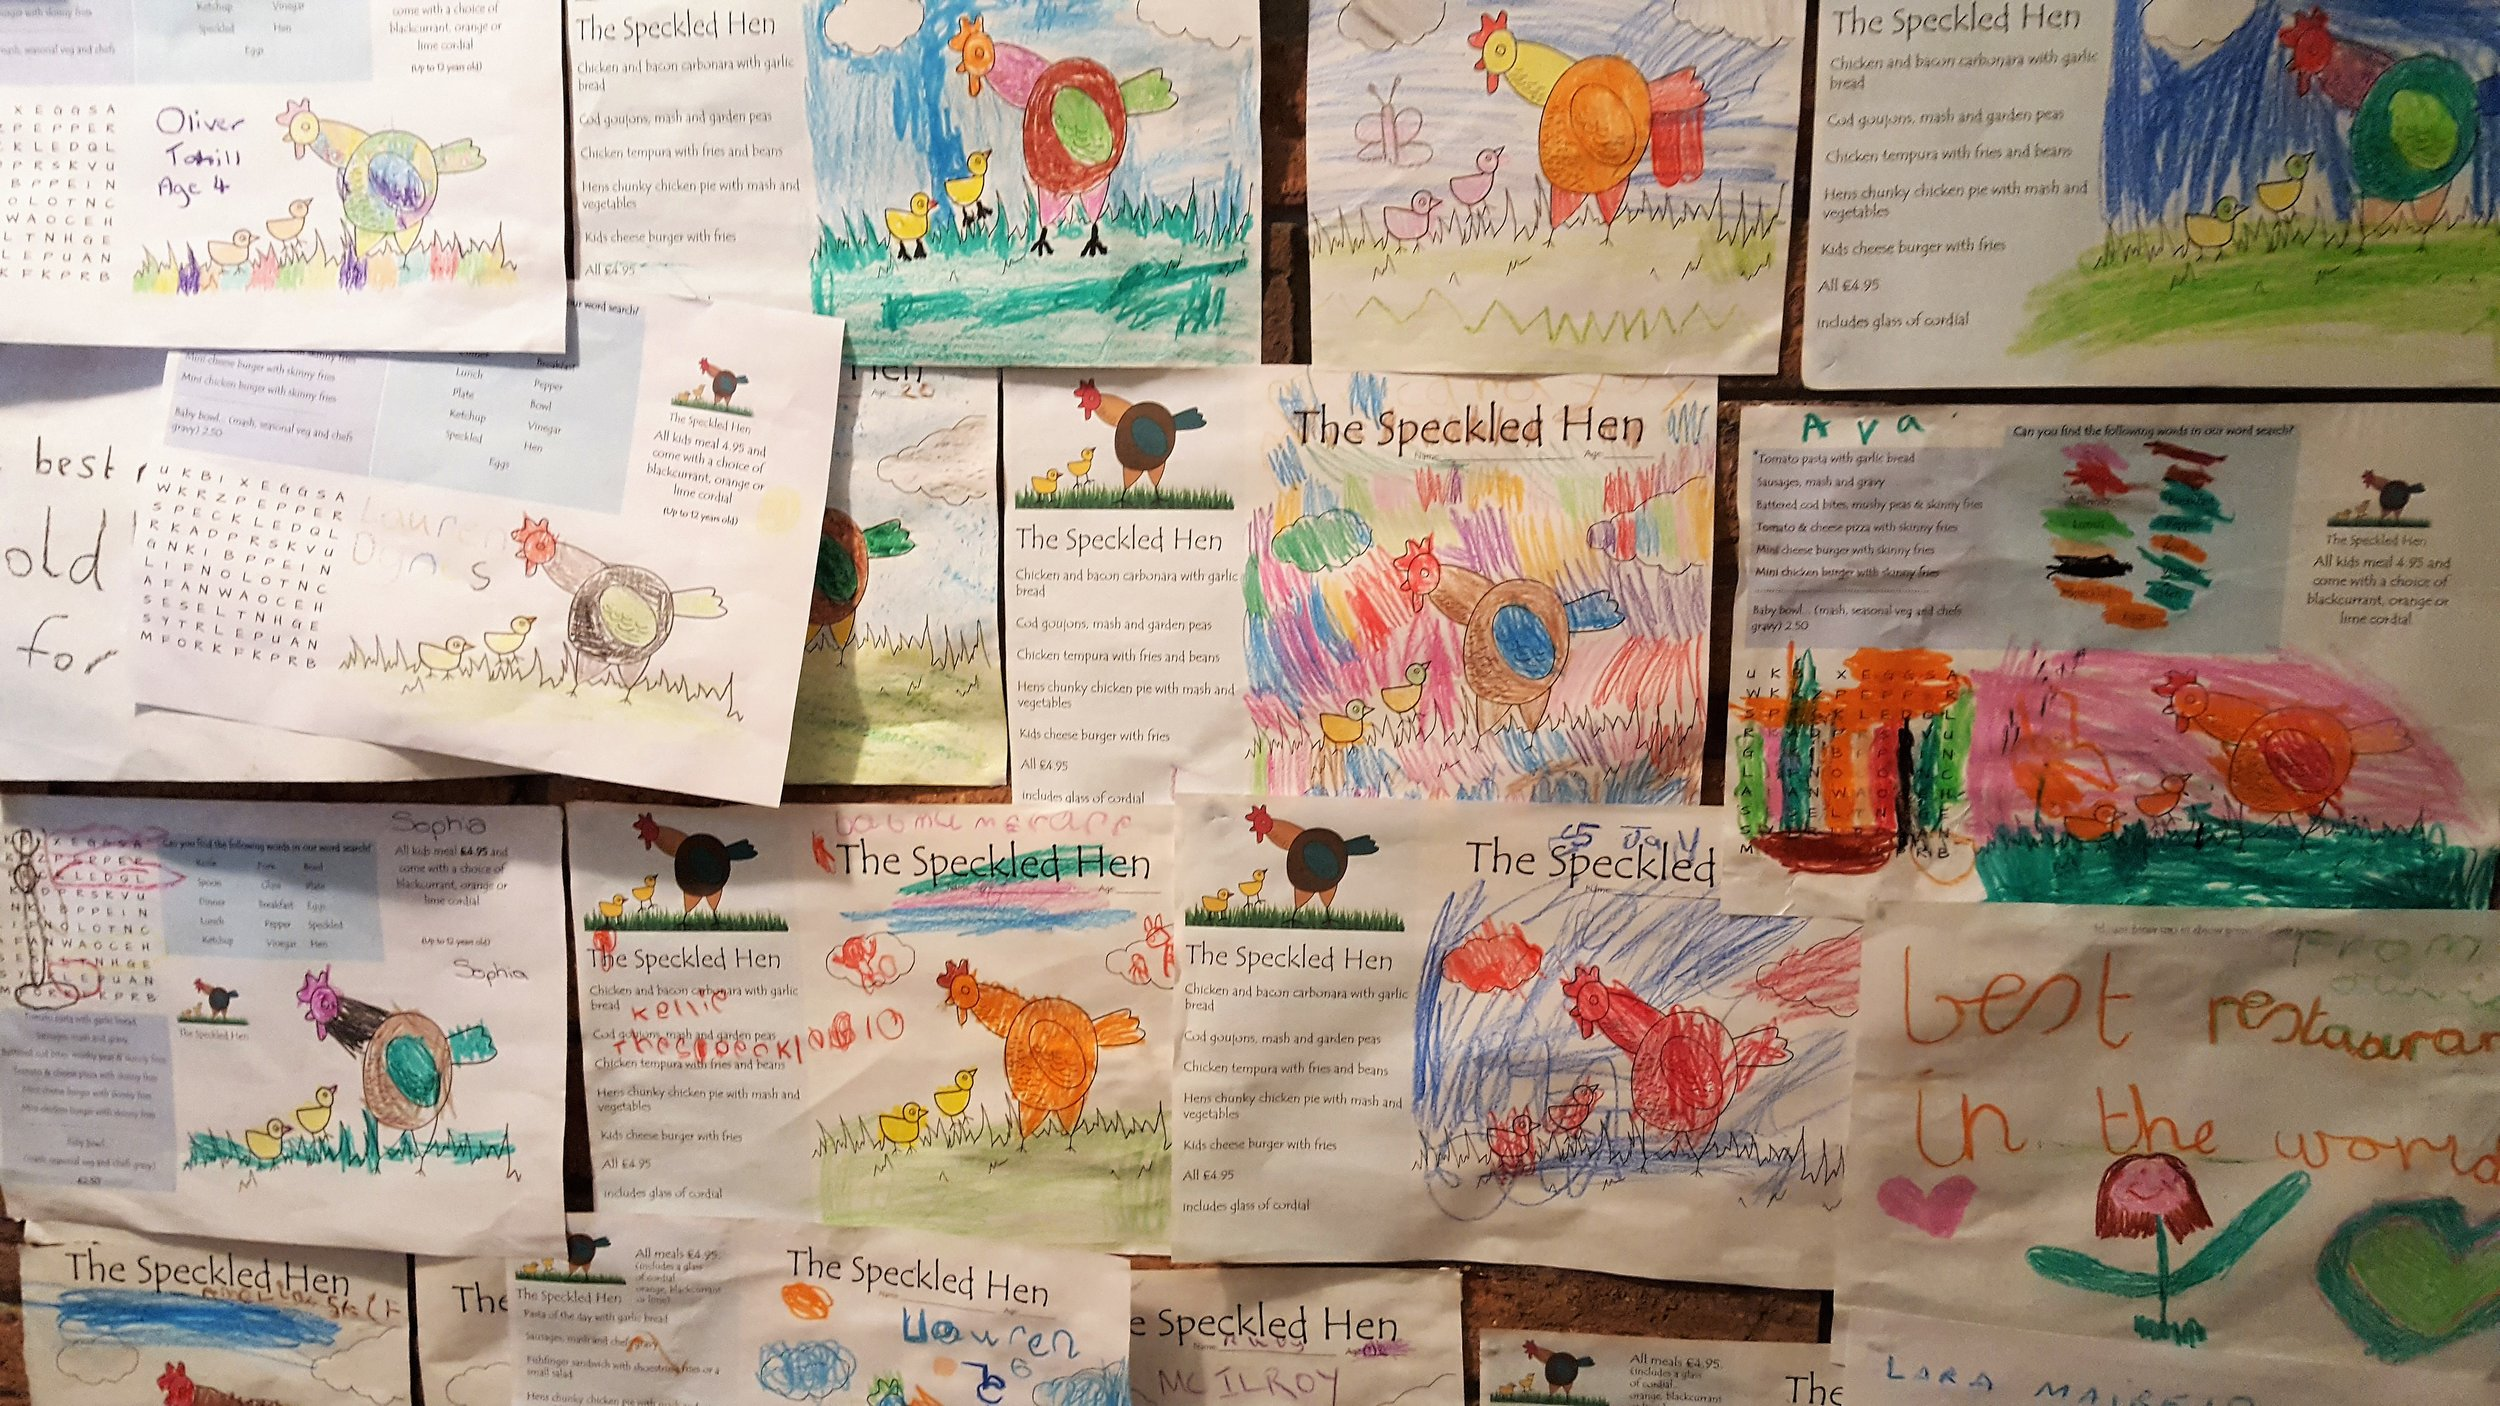 The Speckled Hen childrens menu